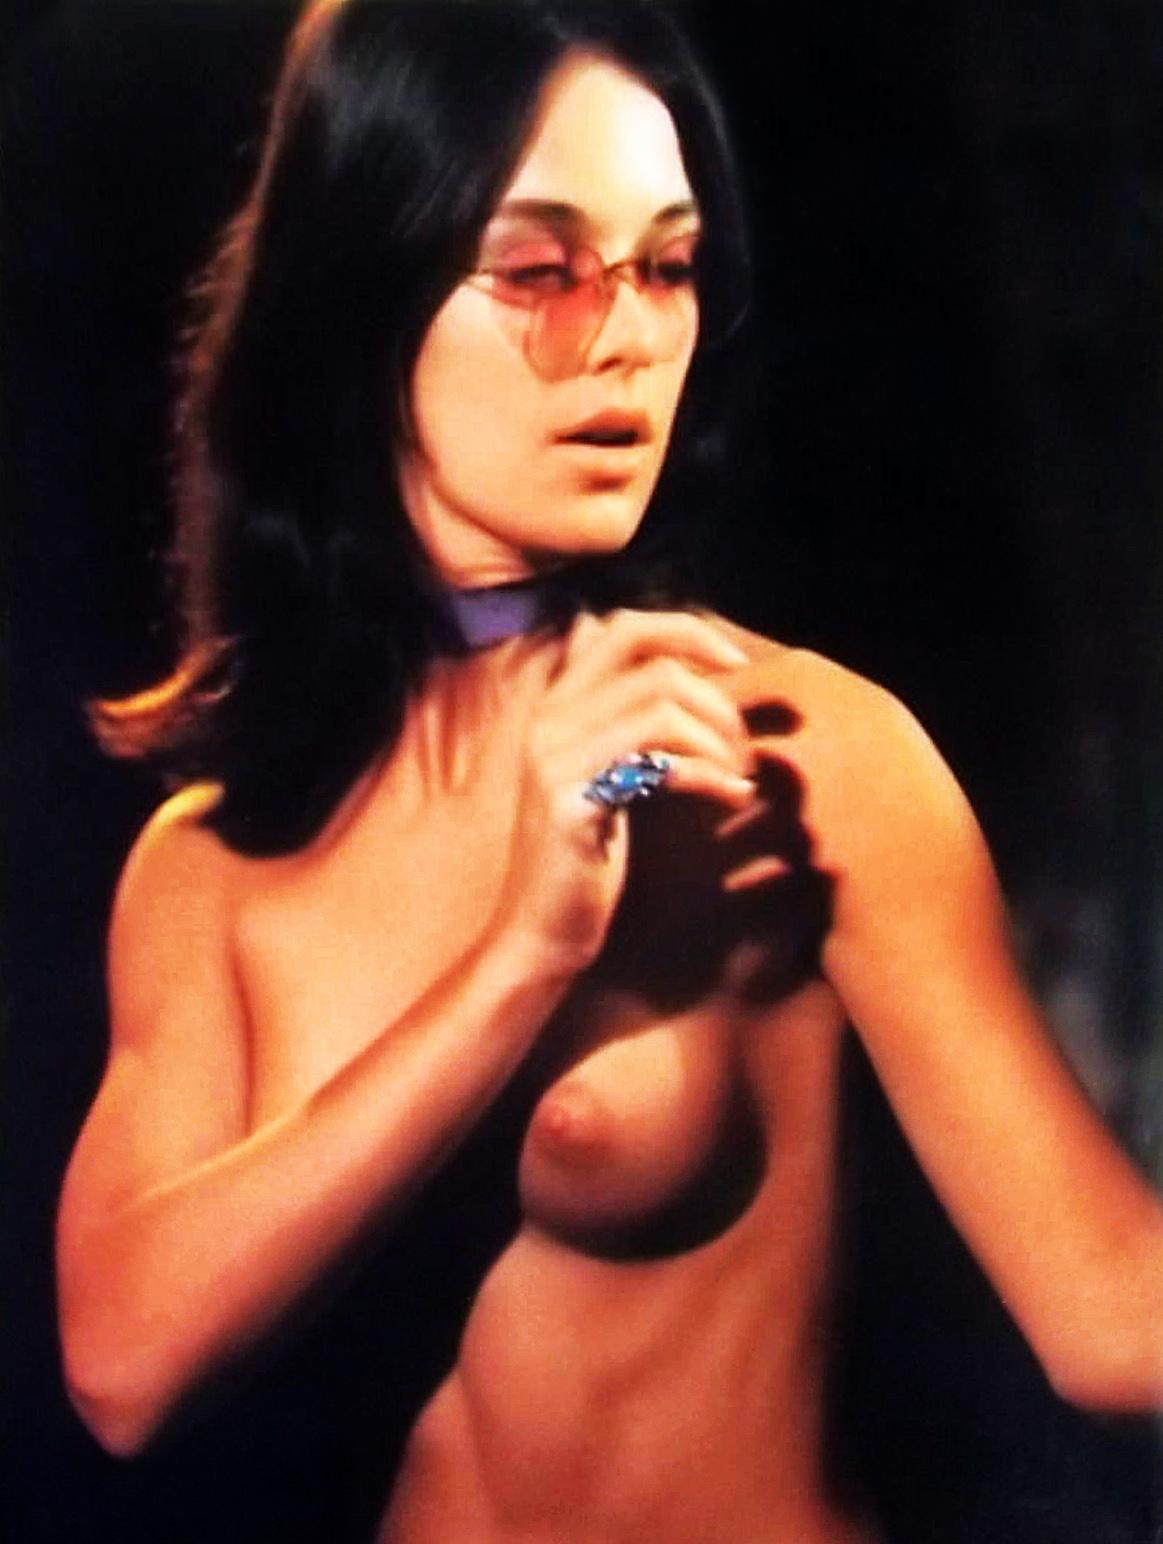 Joanna Cameron topless BS I LOVE you 2.JPG